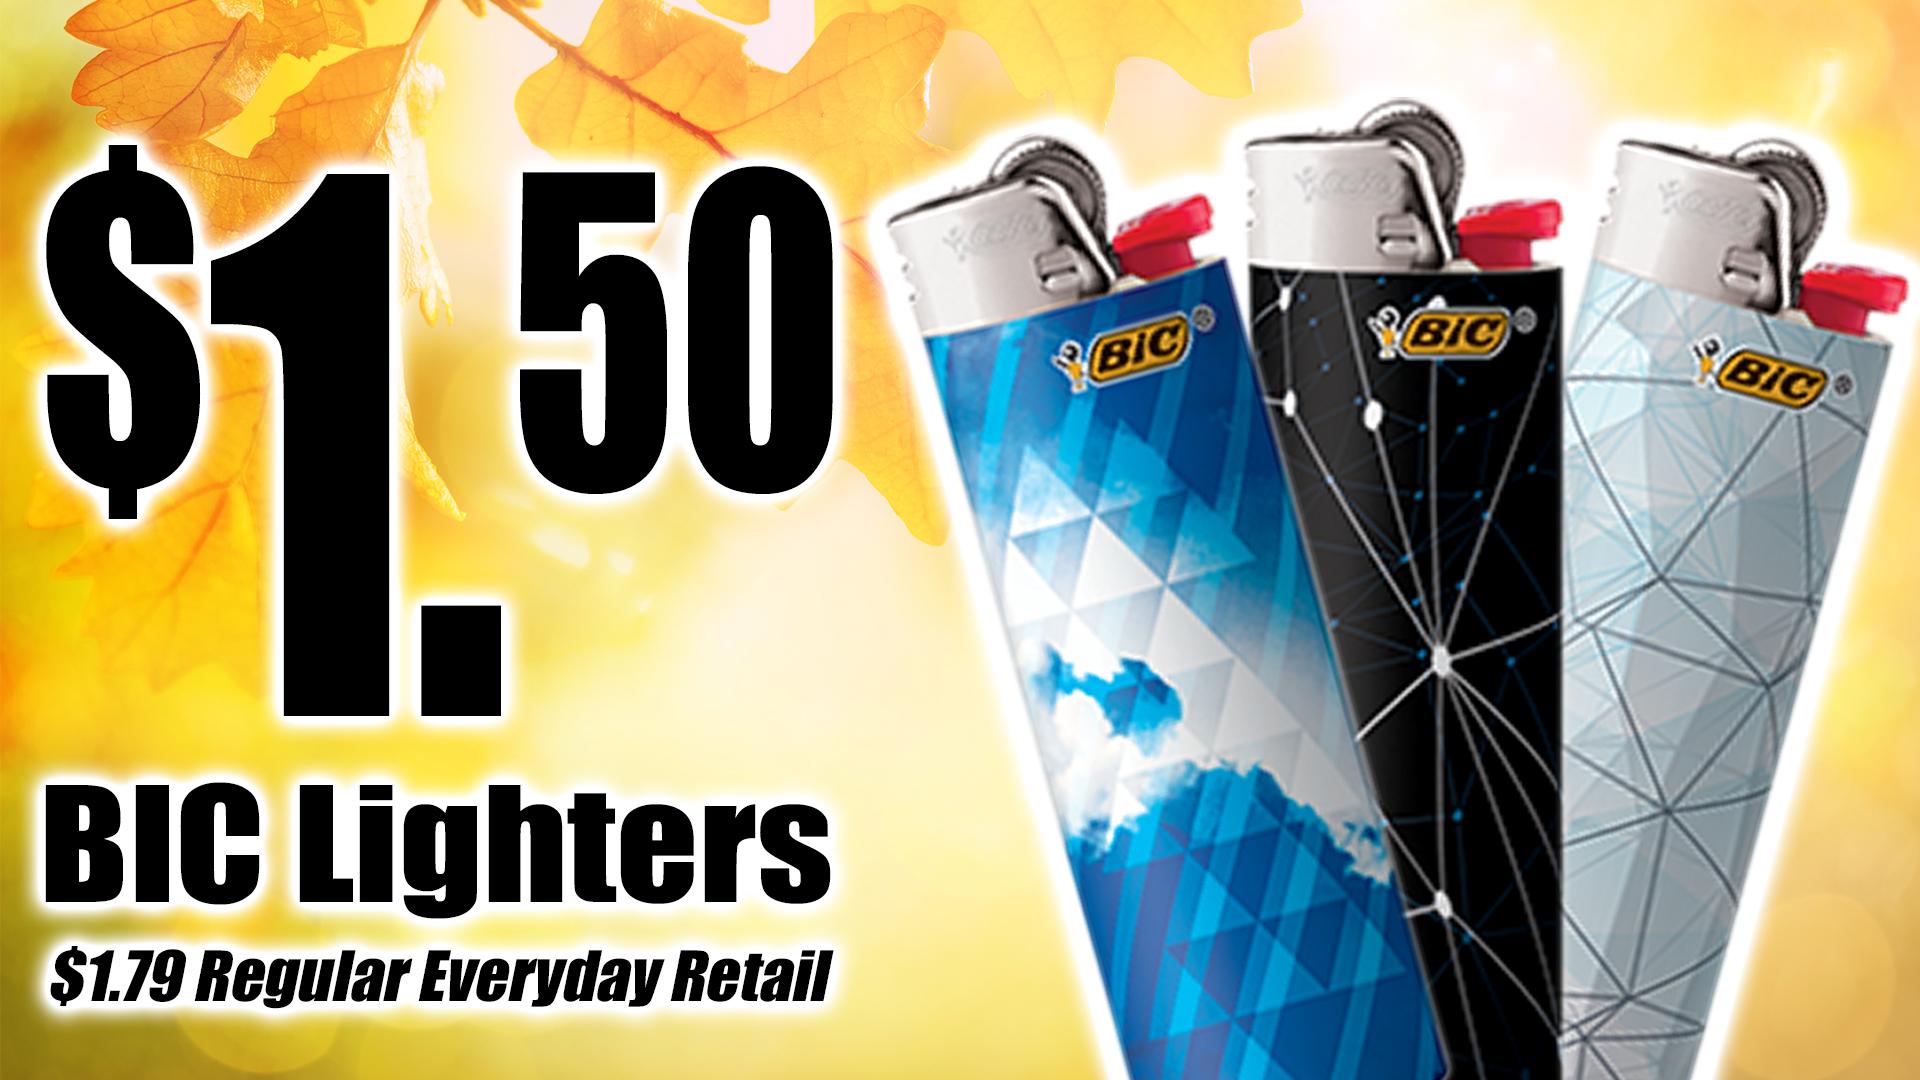 BIC Lighter Promo 2019